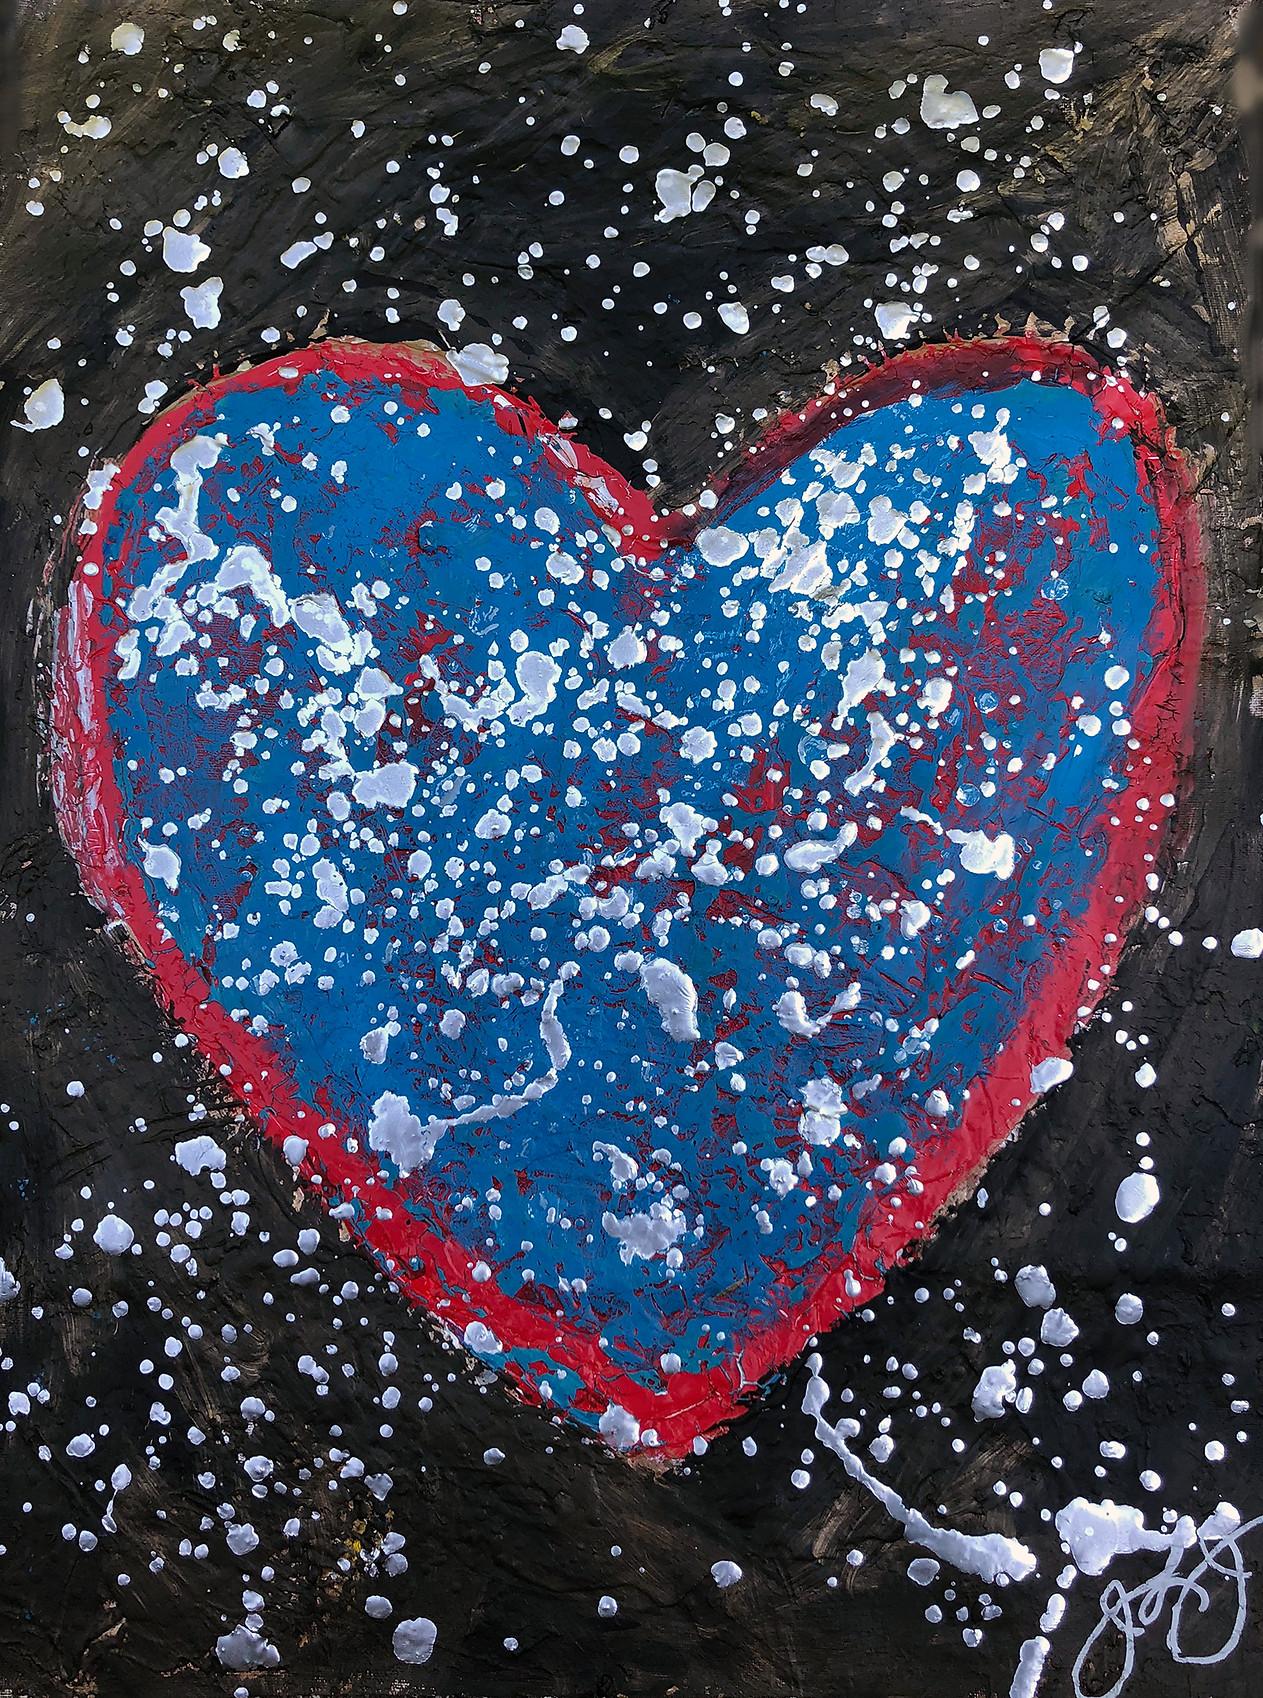 essen's heart 17.jpg